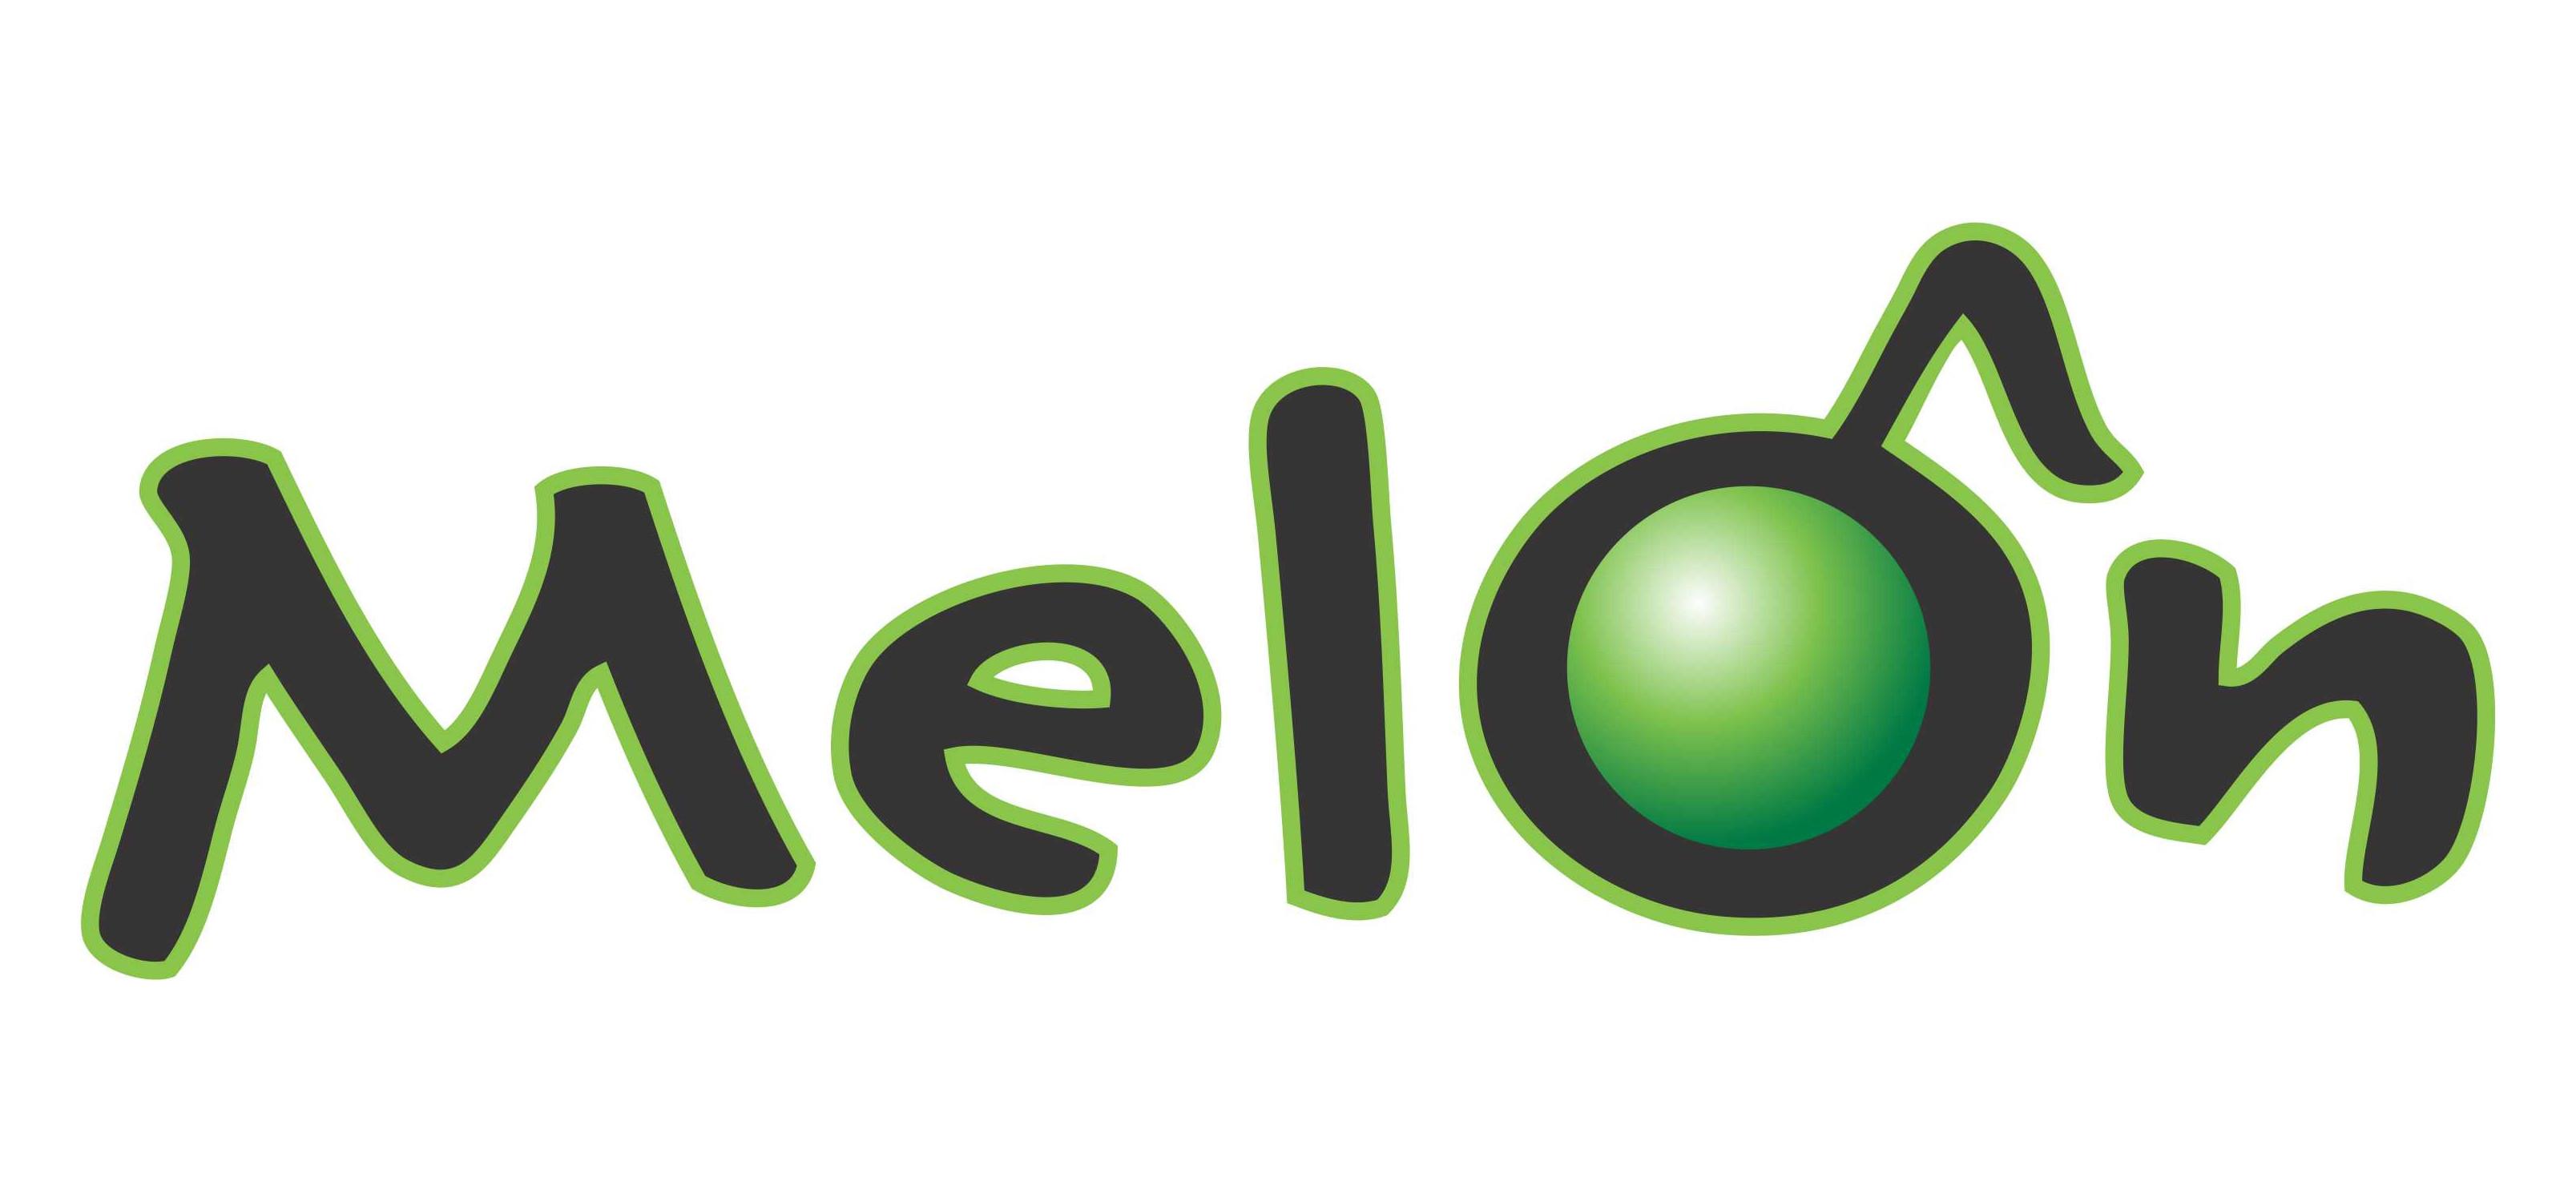 MelOn 是個韓國知名的音源網站,也是韓國人收聽和下載音樂的線上音樂平台。